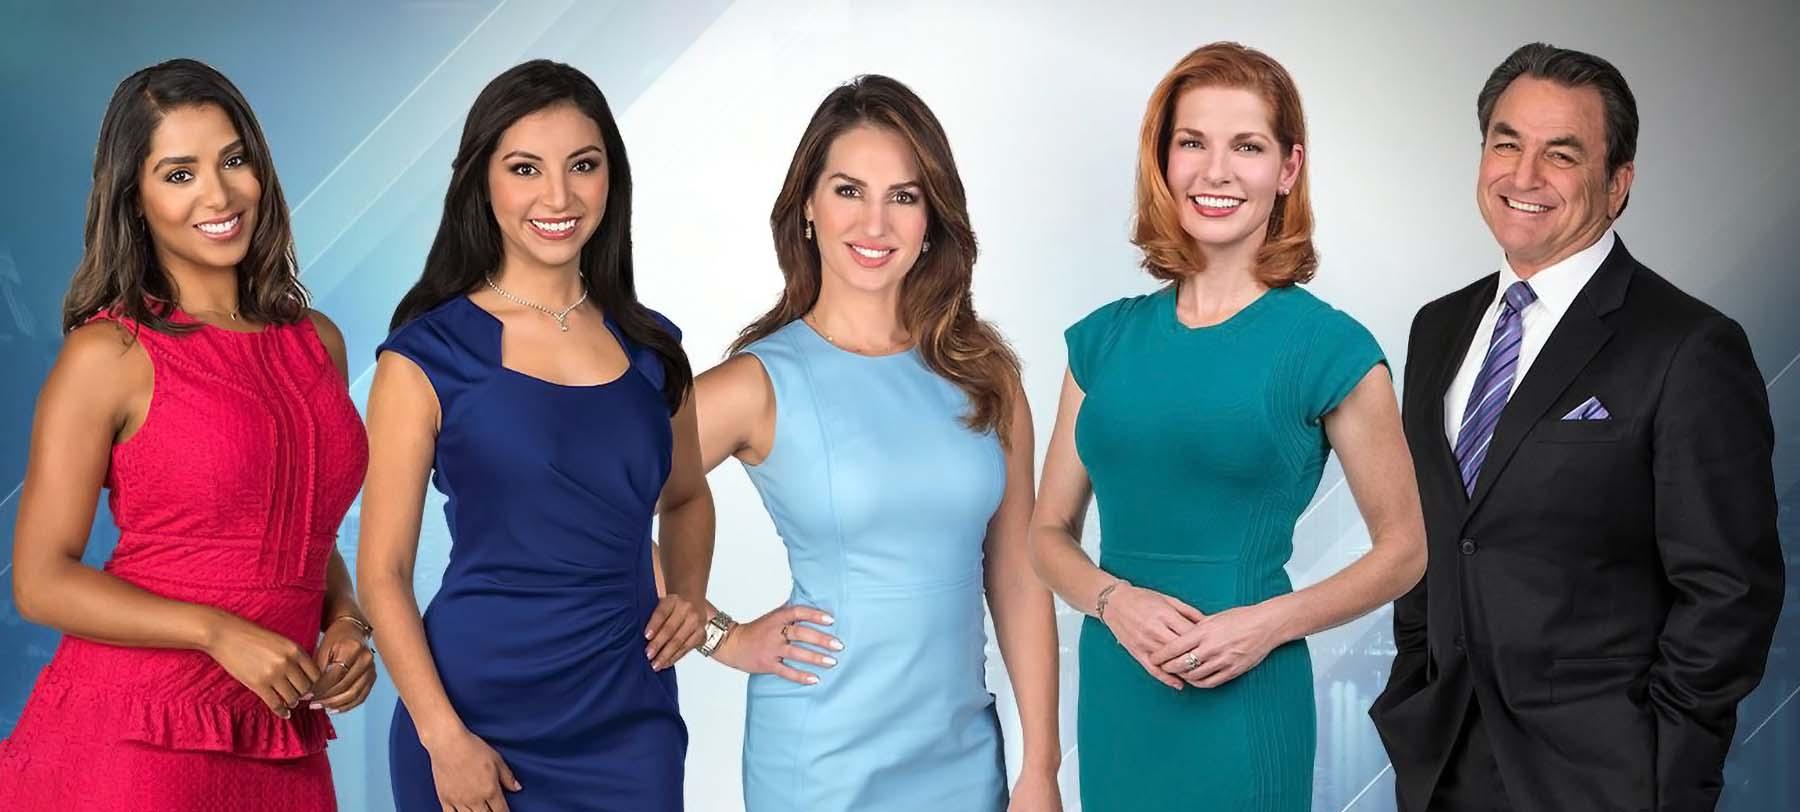 News Team of NBC 7